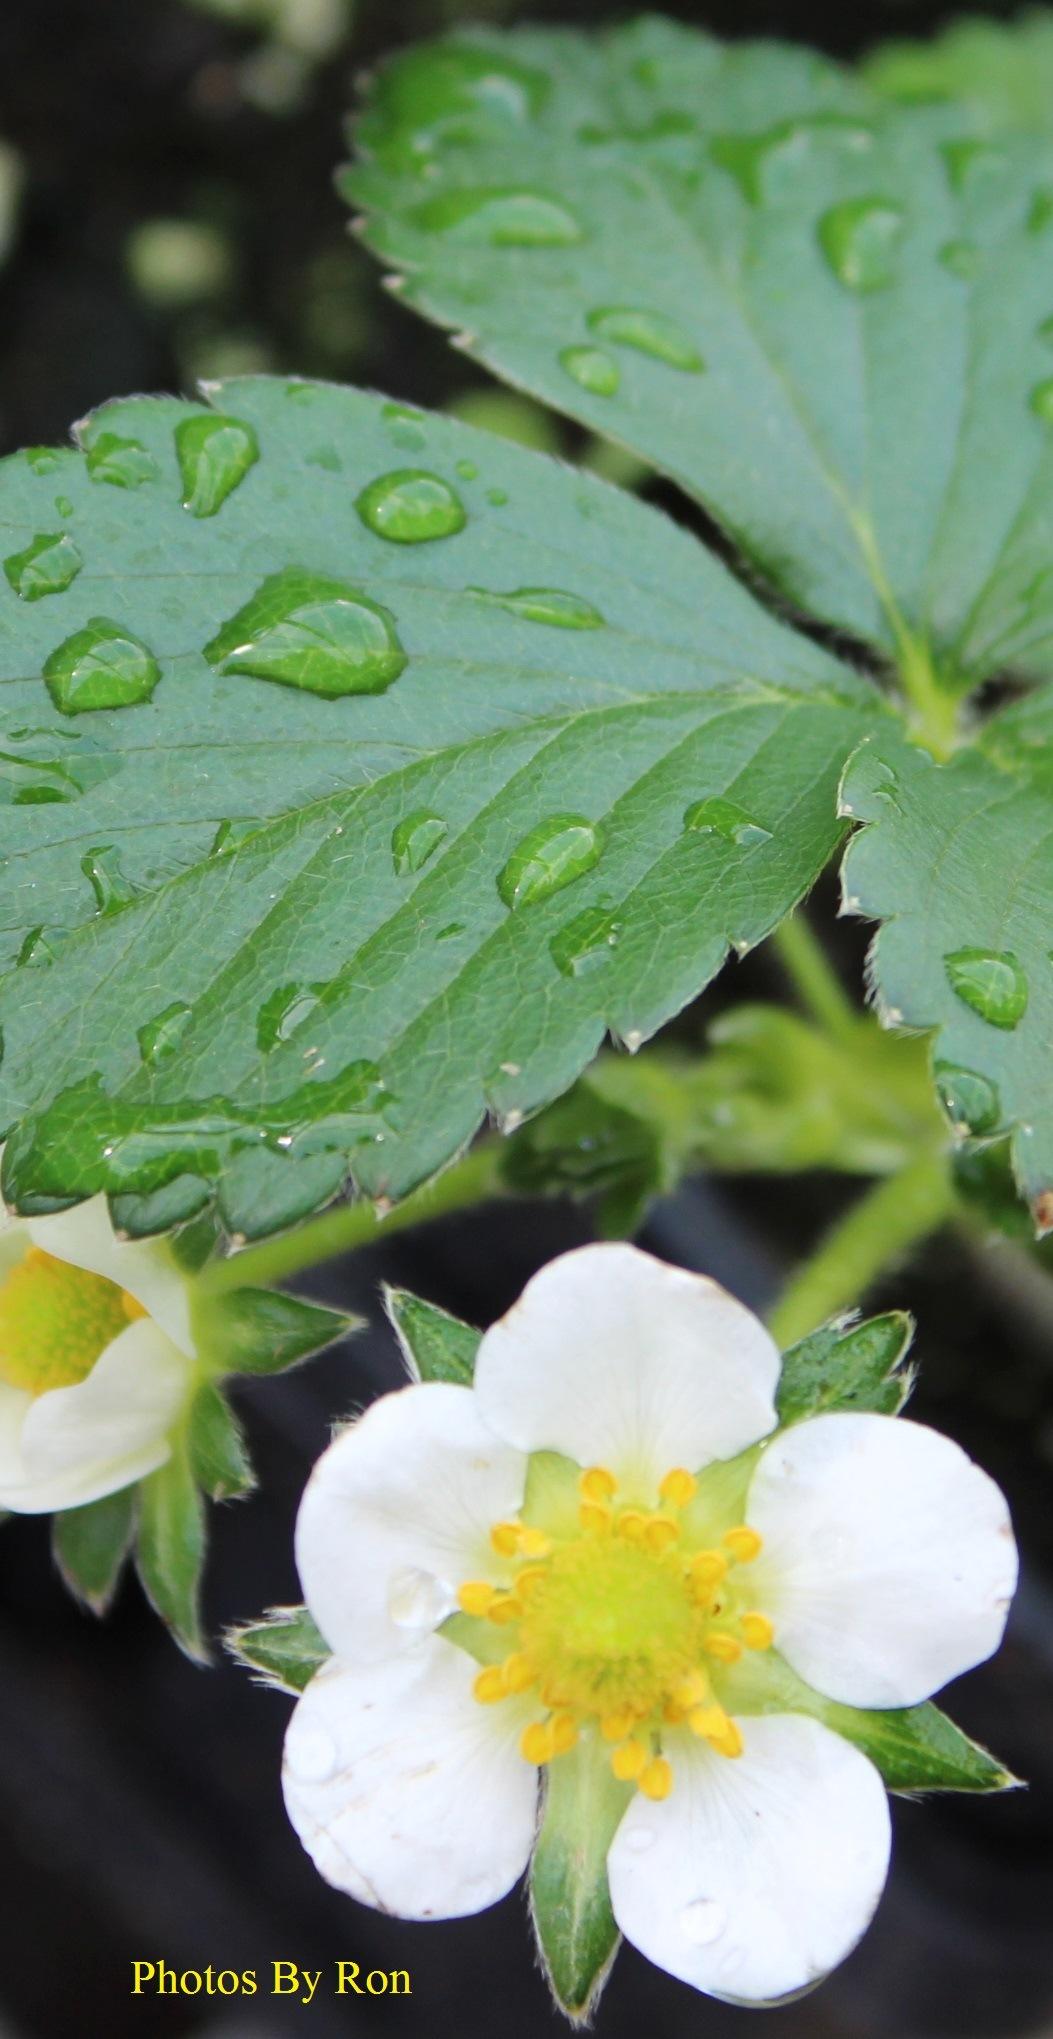 """Strawberry Blossom"" by Ron Berkley"